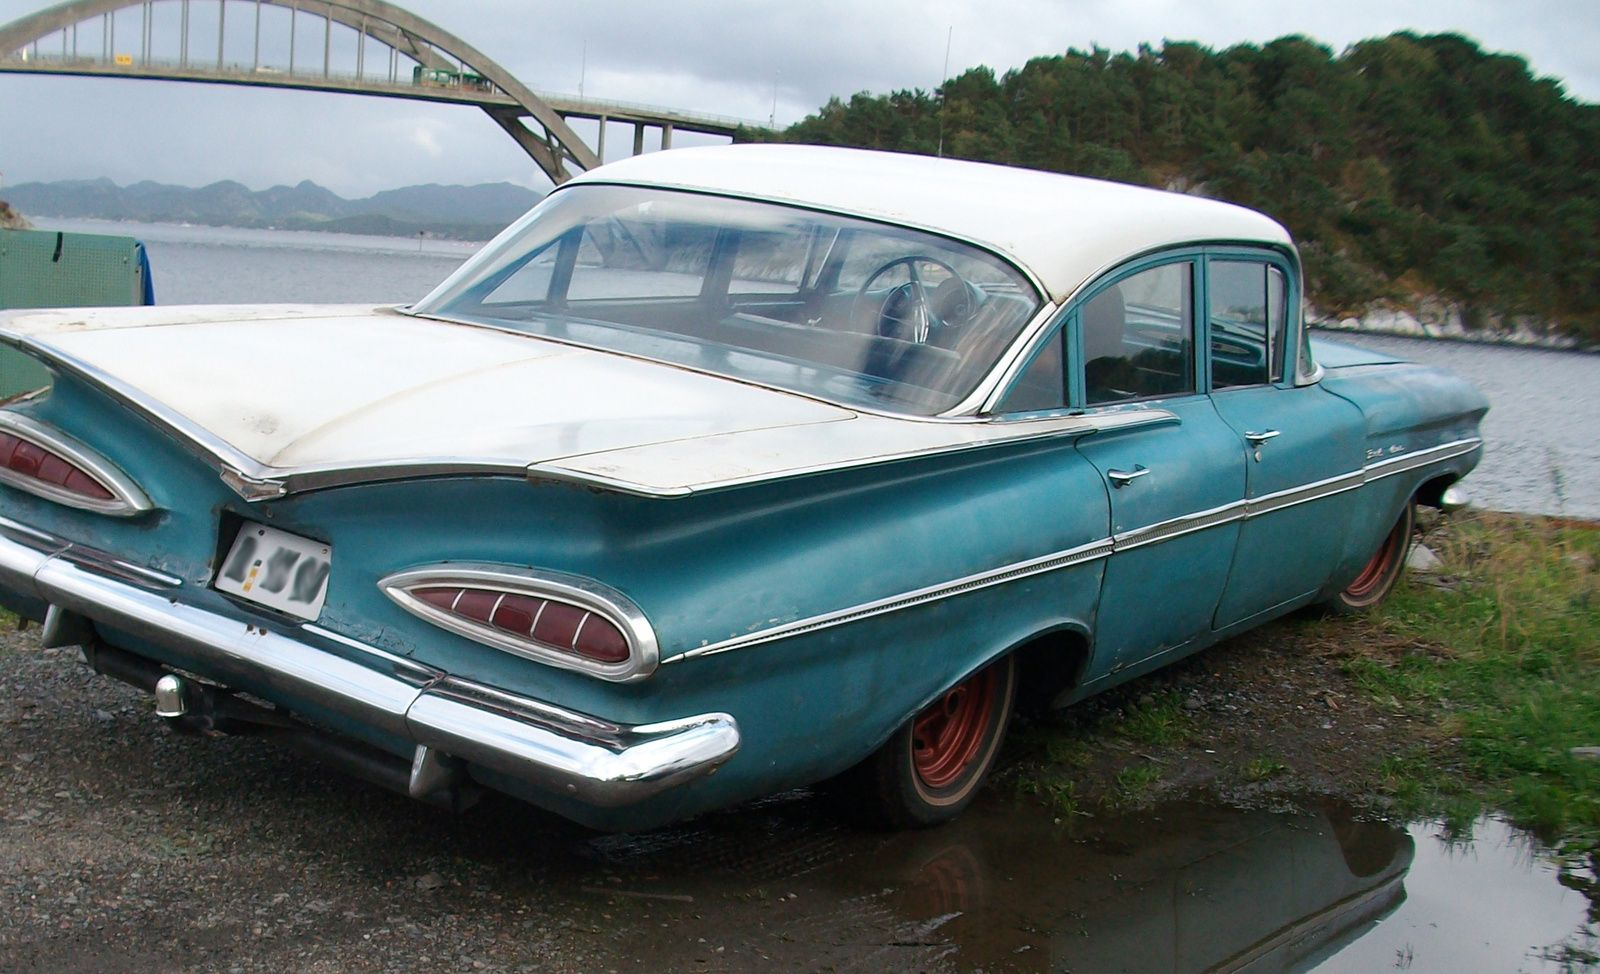 1962 impala chevrolet classic cars pinterest 1962 chevrolet impala 1959 chevrolet bel air wiring diagram [ 1600 x 974 Pixel ]